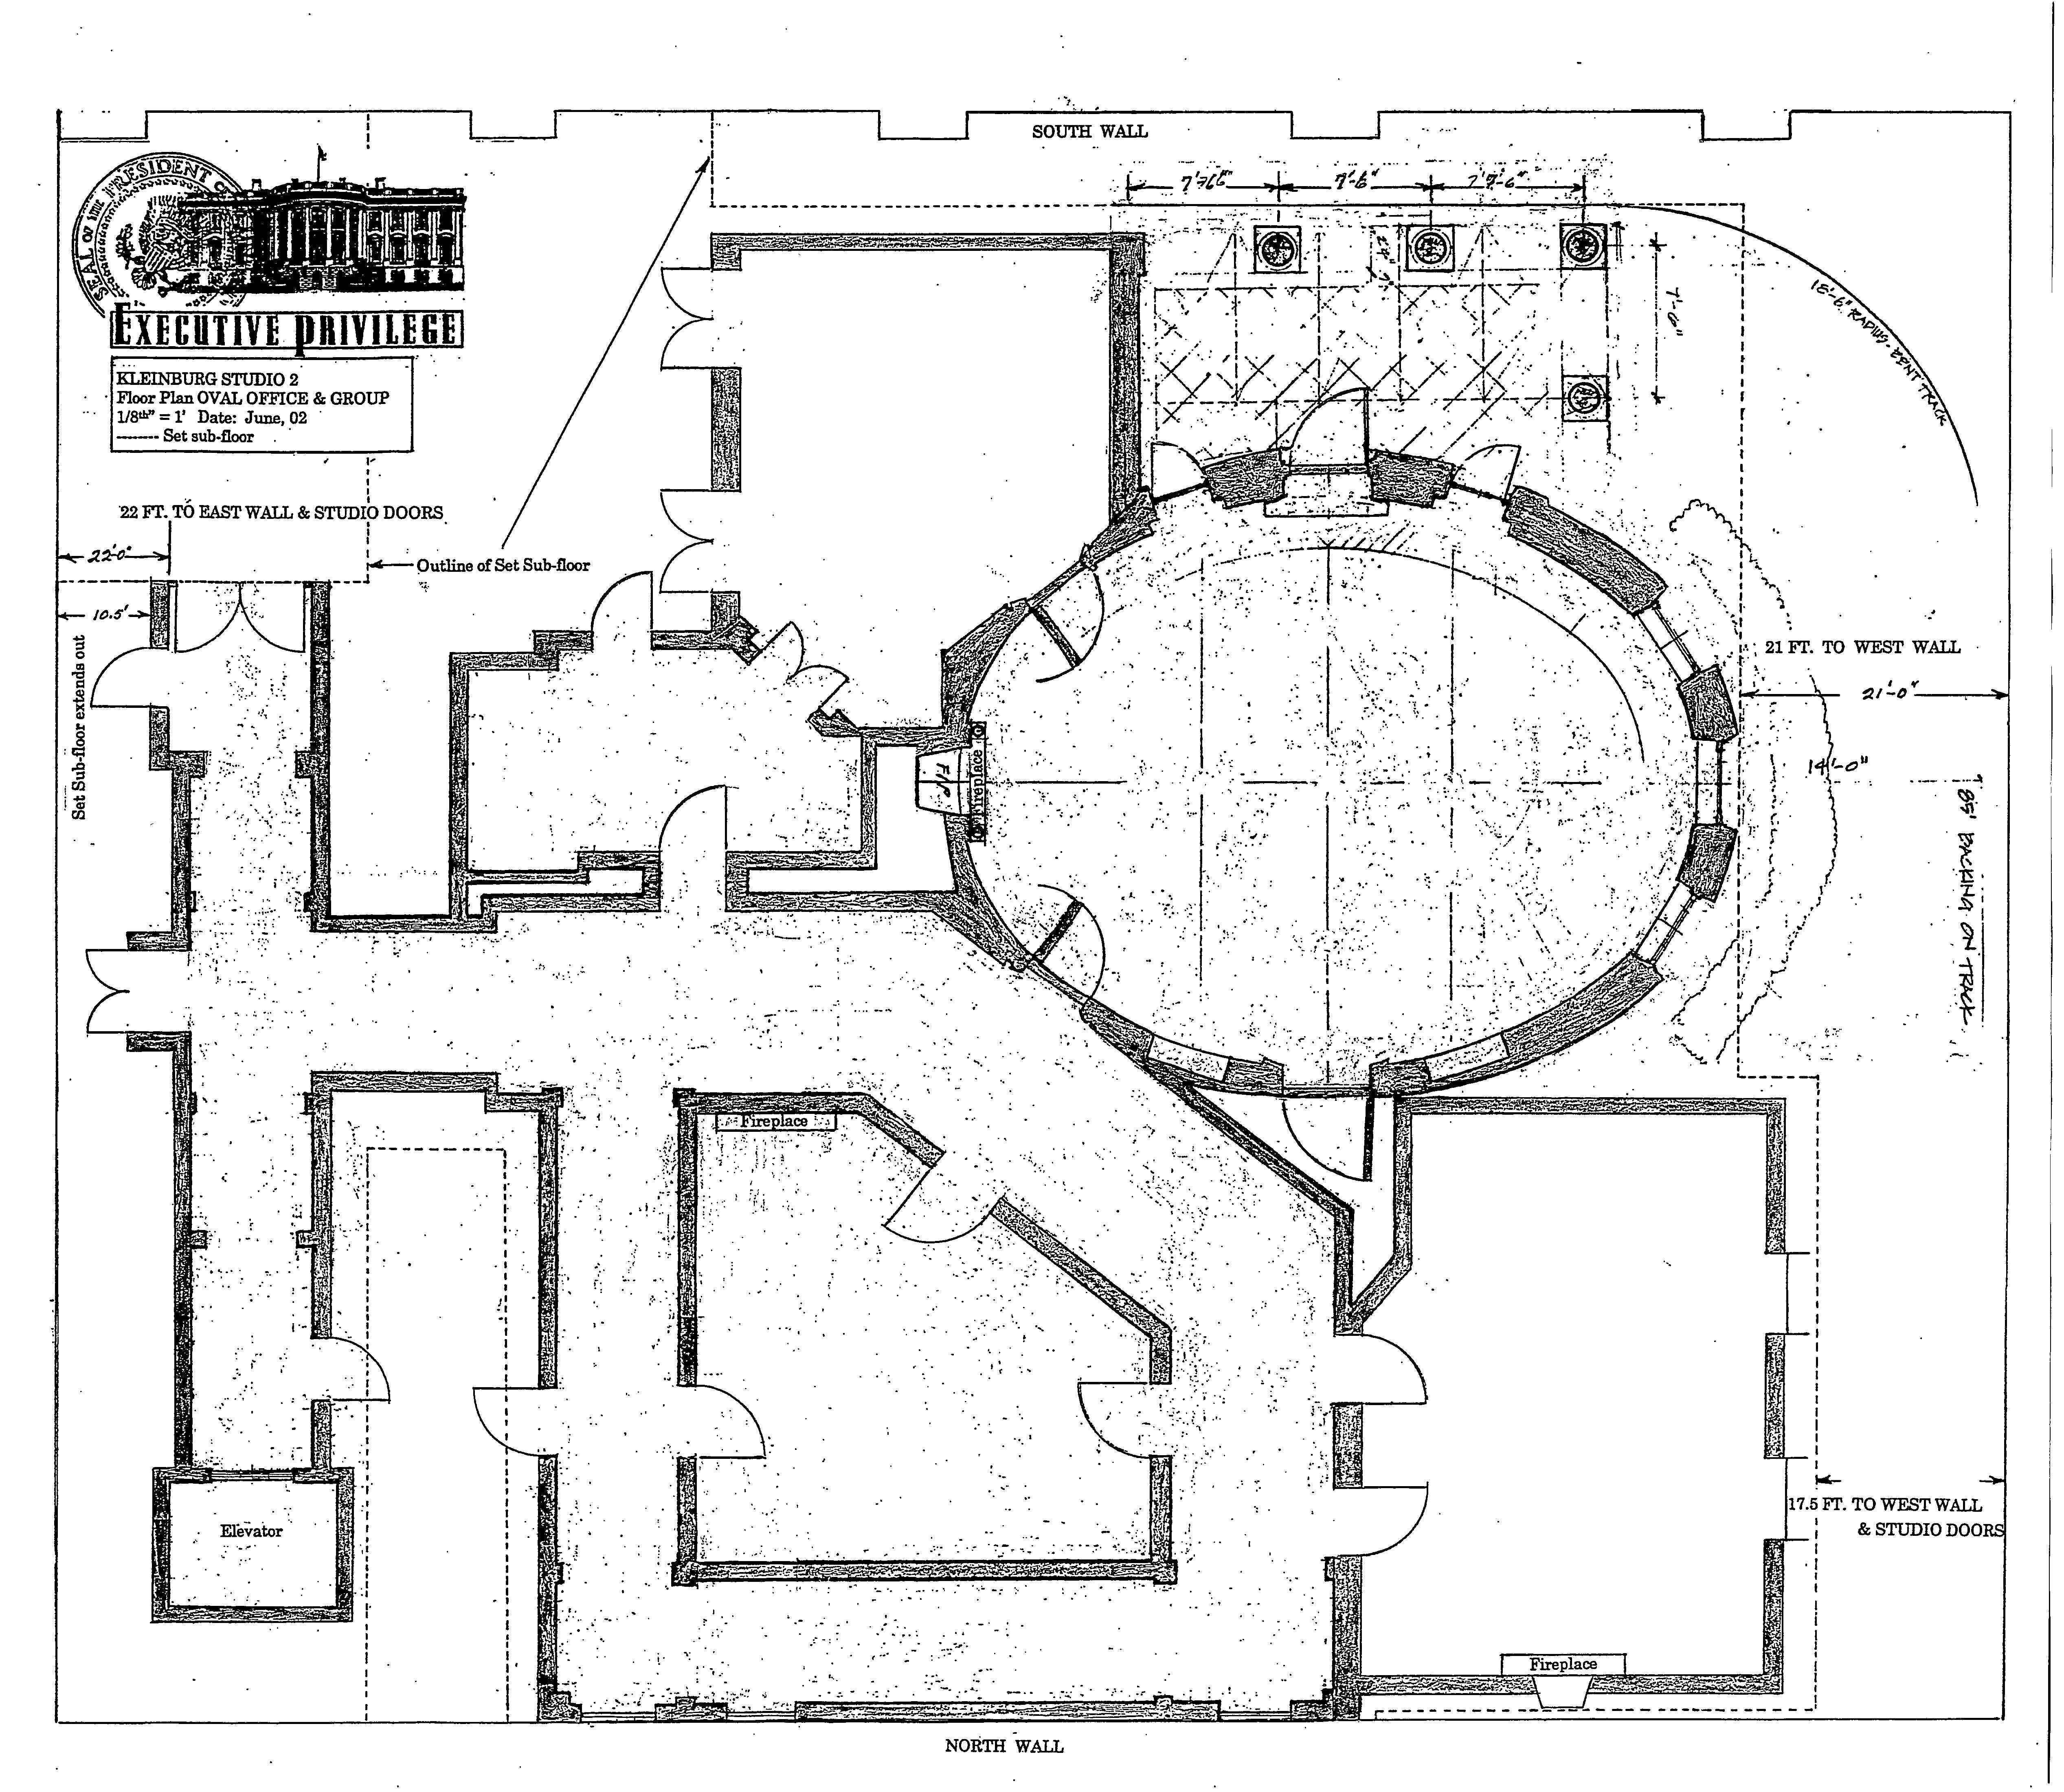 white house diagram delco remy alternator wiring oval office floor plan dream pinterest